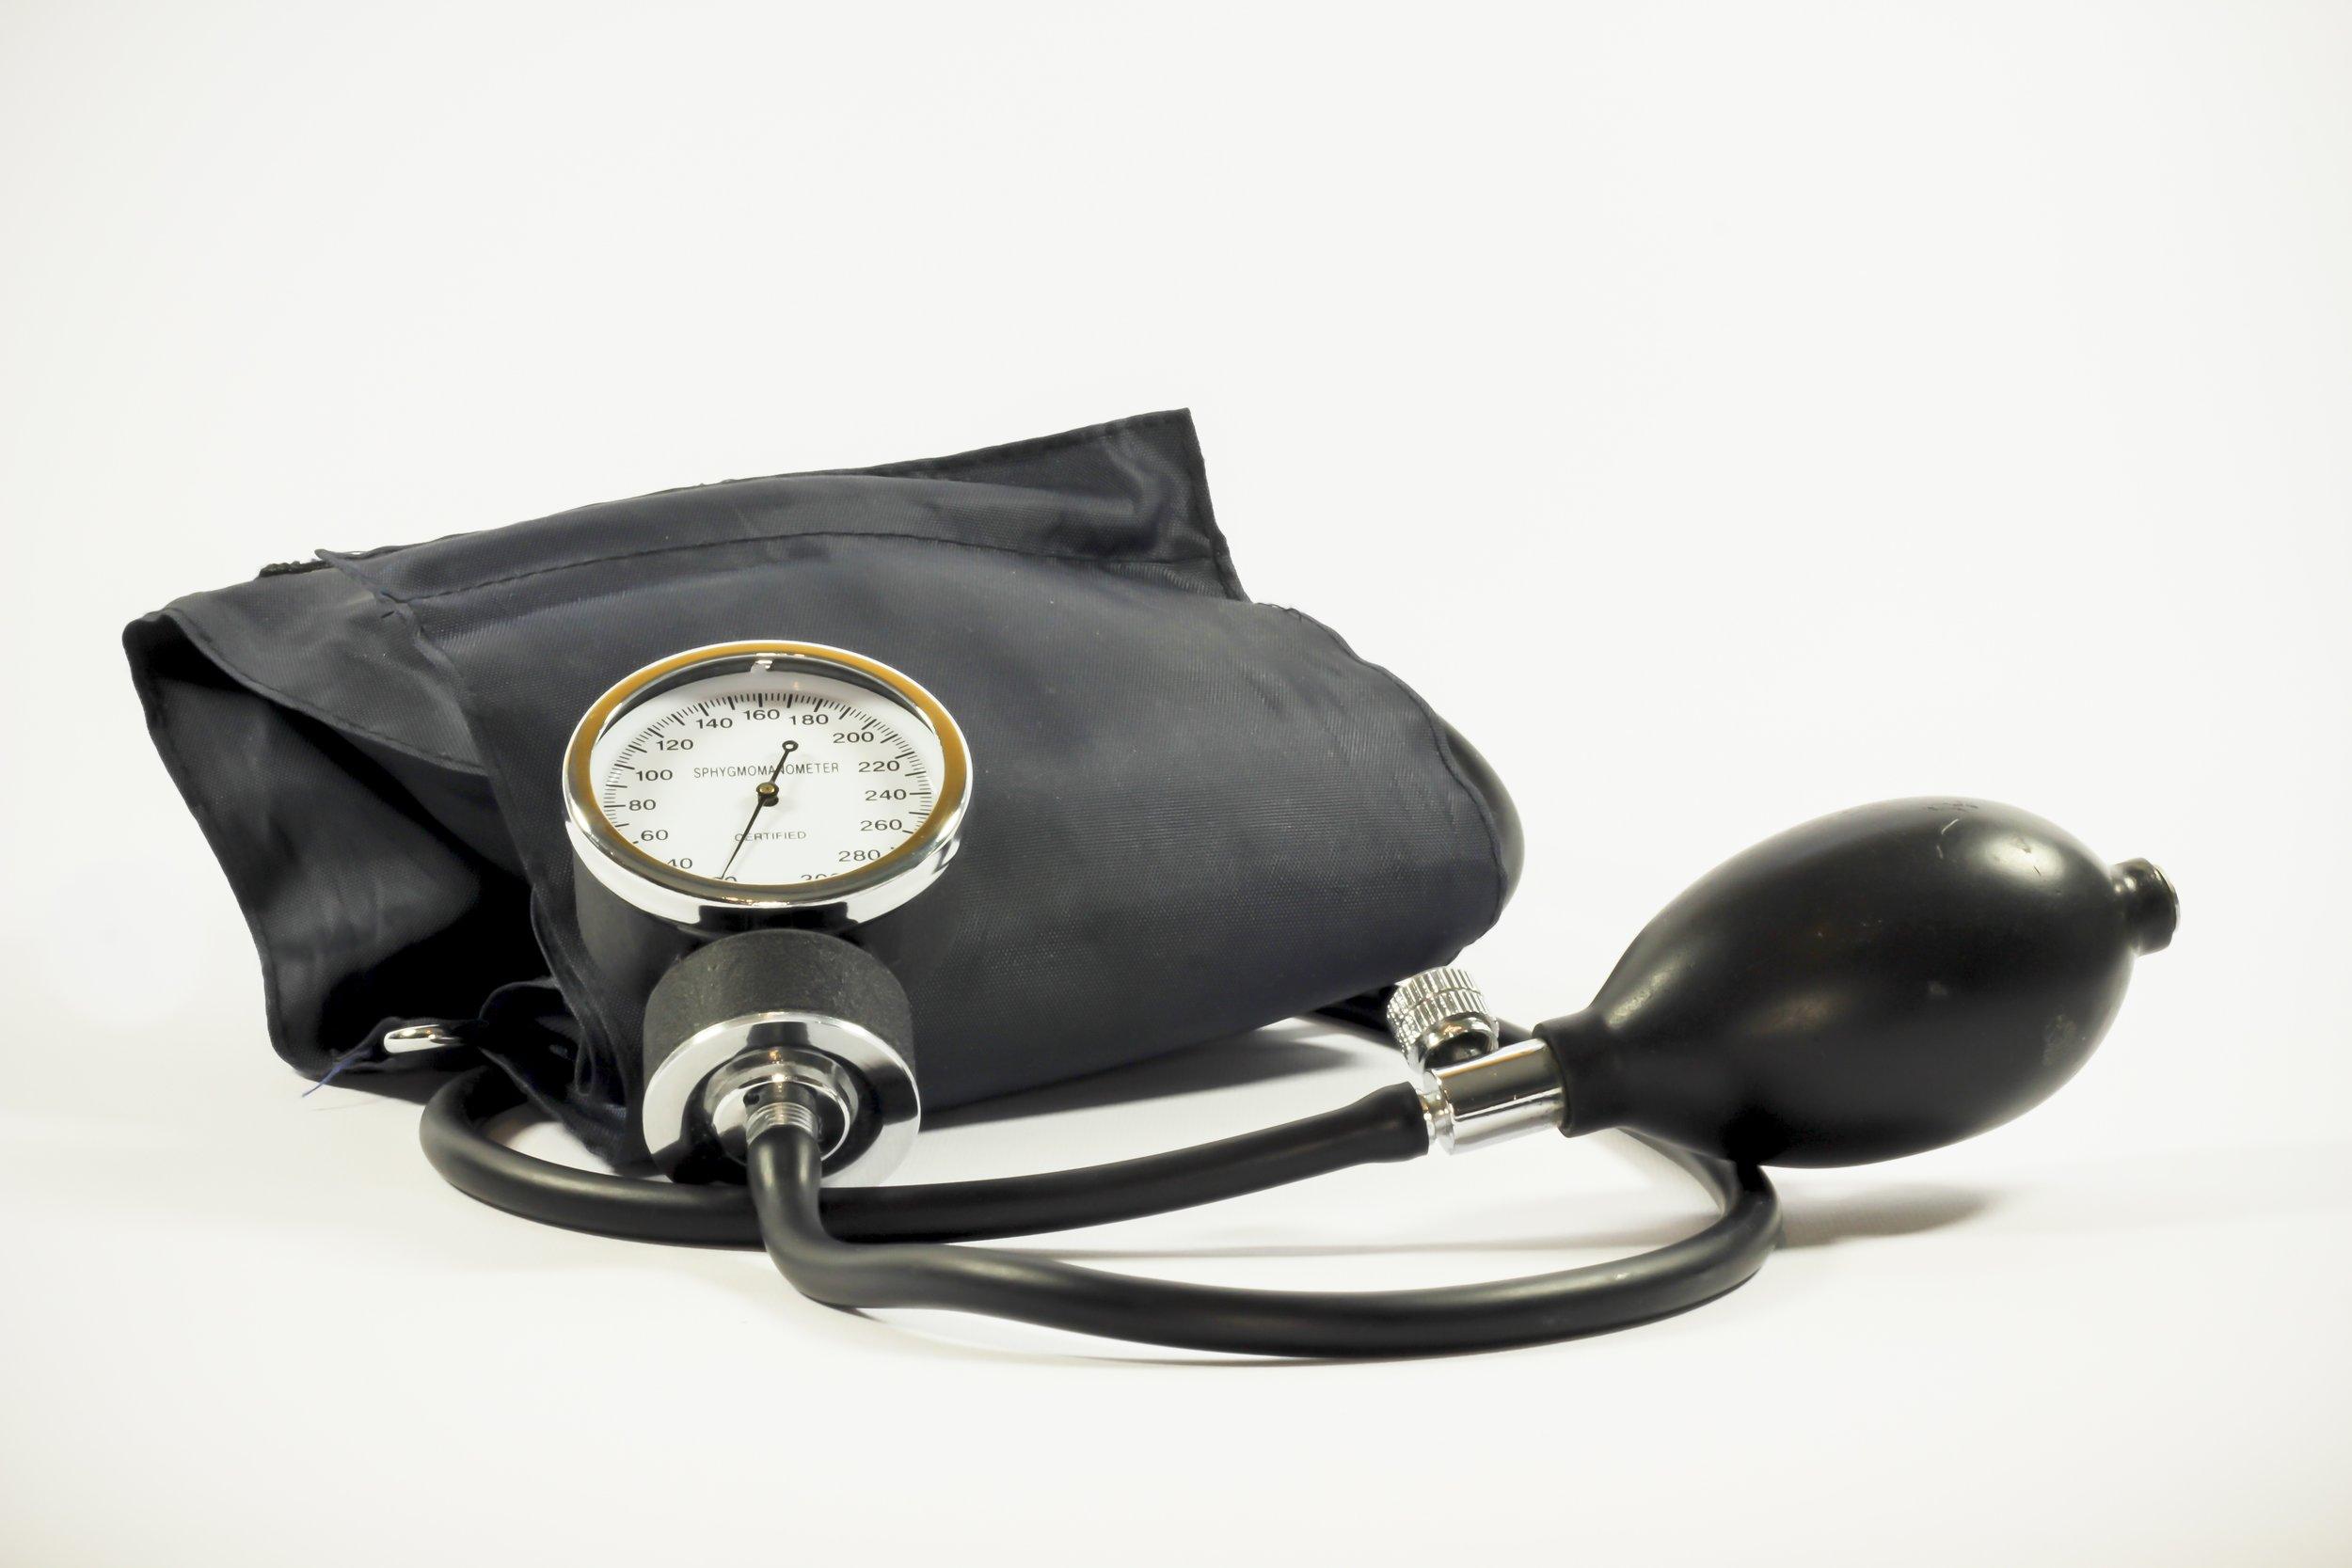 Source:https://static.pexels.com/photos/33258/blood-pressure-pressure-gauge-medical-the-test.jpg